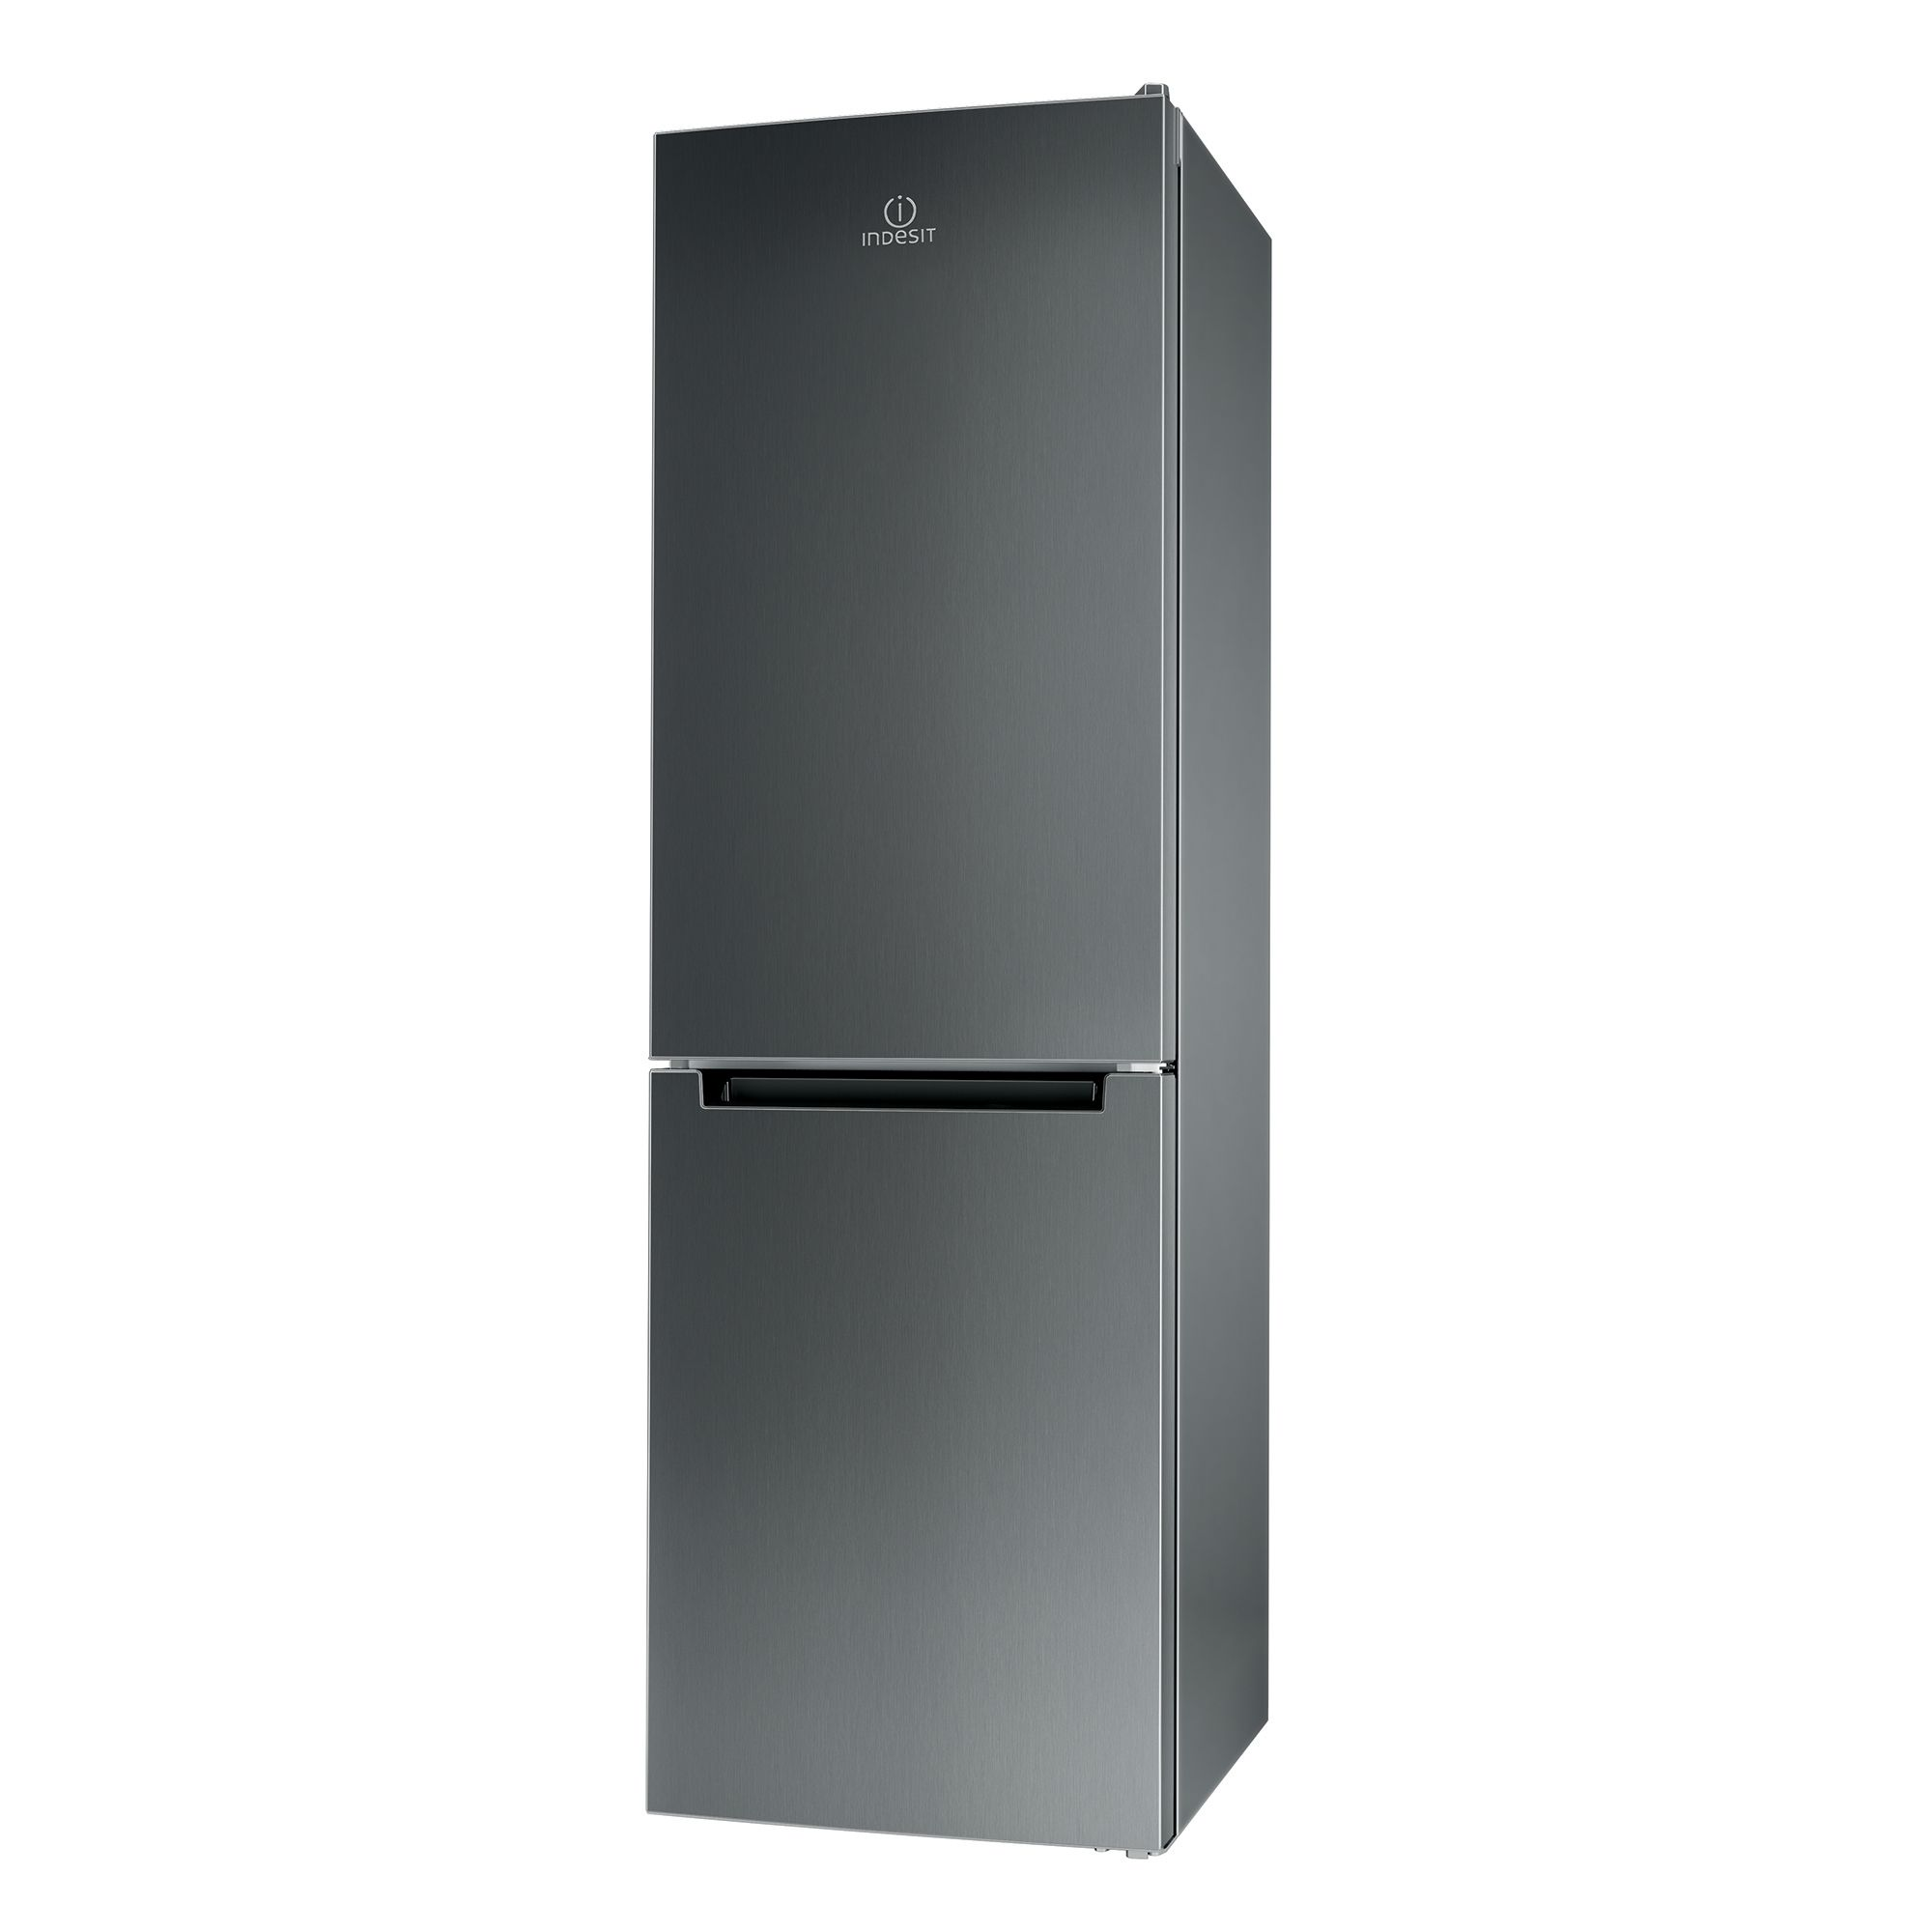 Combine frigorifice ieftine si bune - Indesit LR9 S1Q F X forum